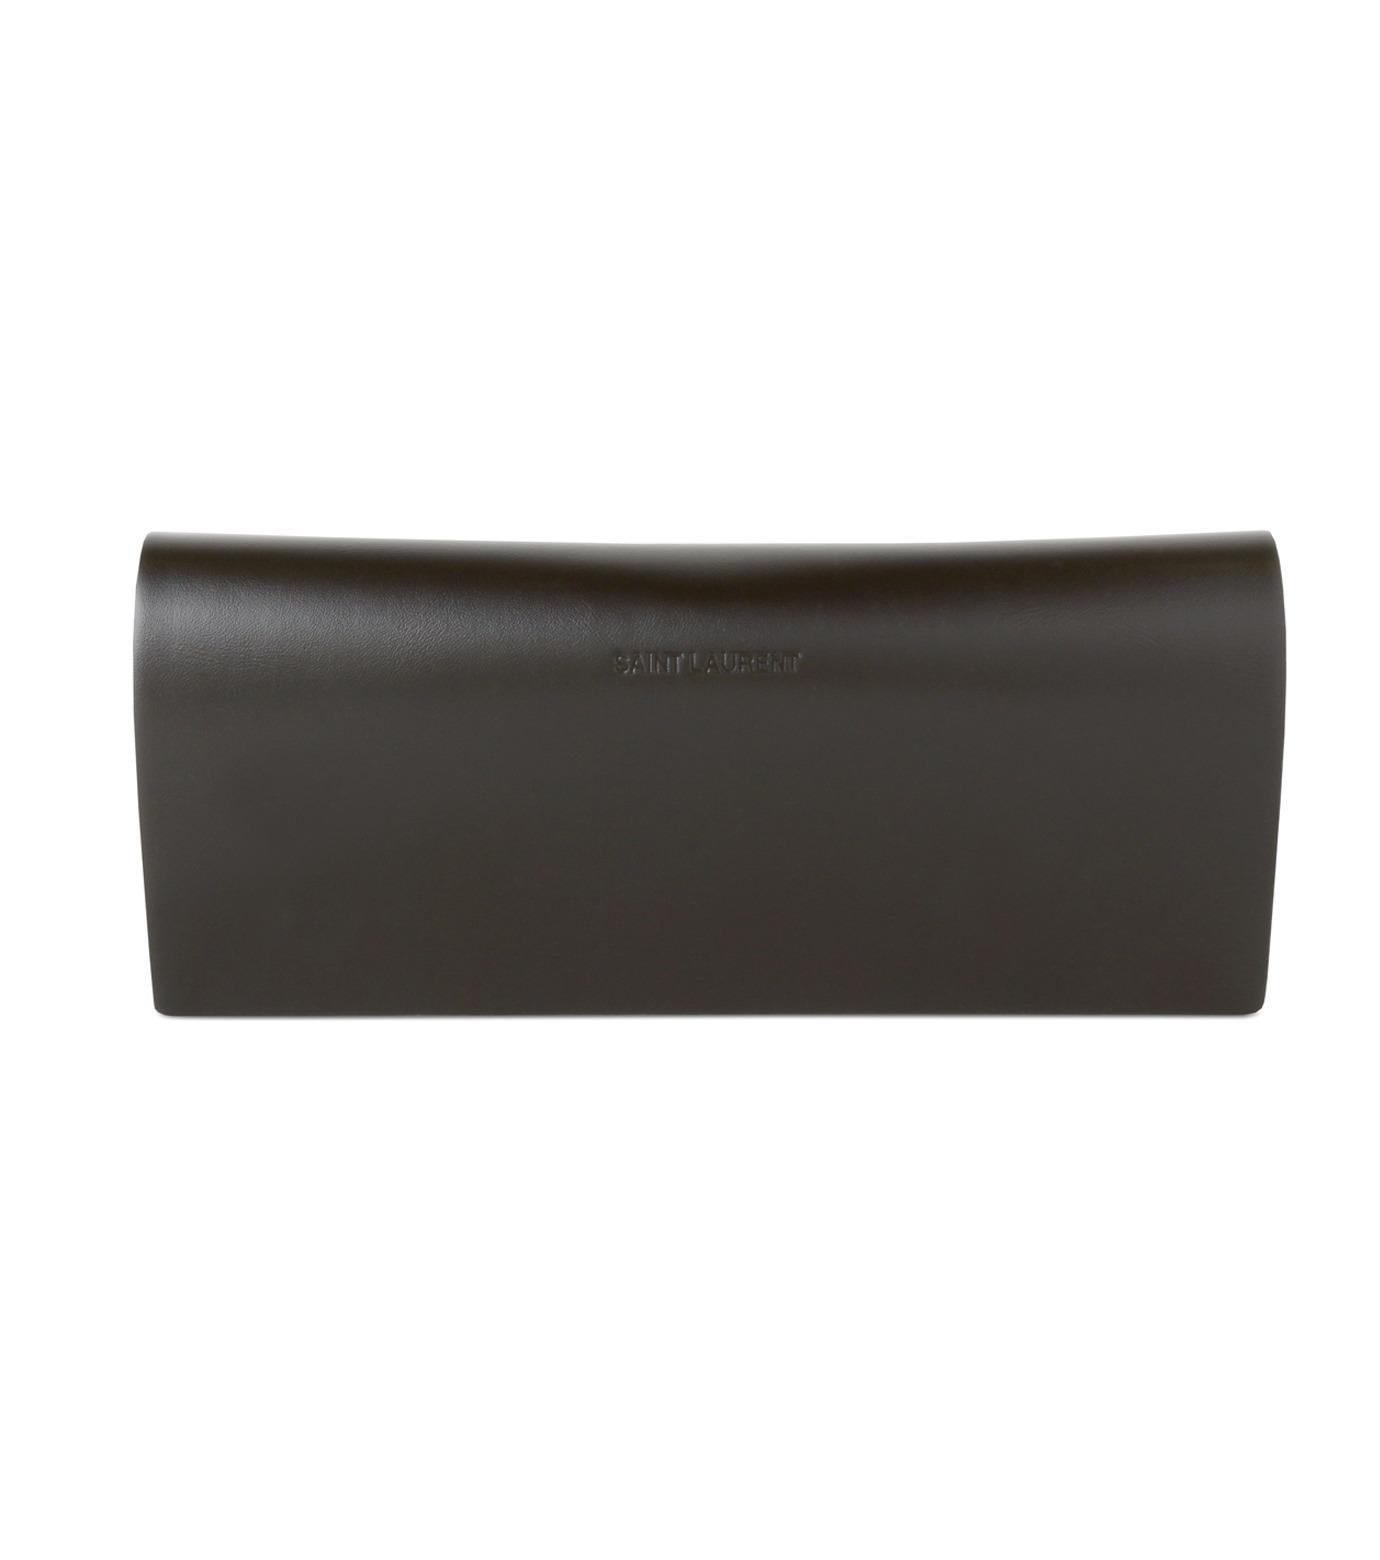 SAINT LAURENT(サンローラン)のTeardrop-GOLD(アイウェア/eyewear)-419695-Y9910-2 拡大詳細画像4